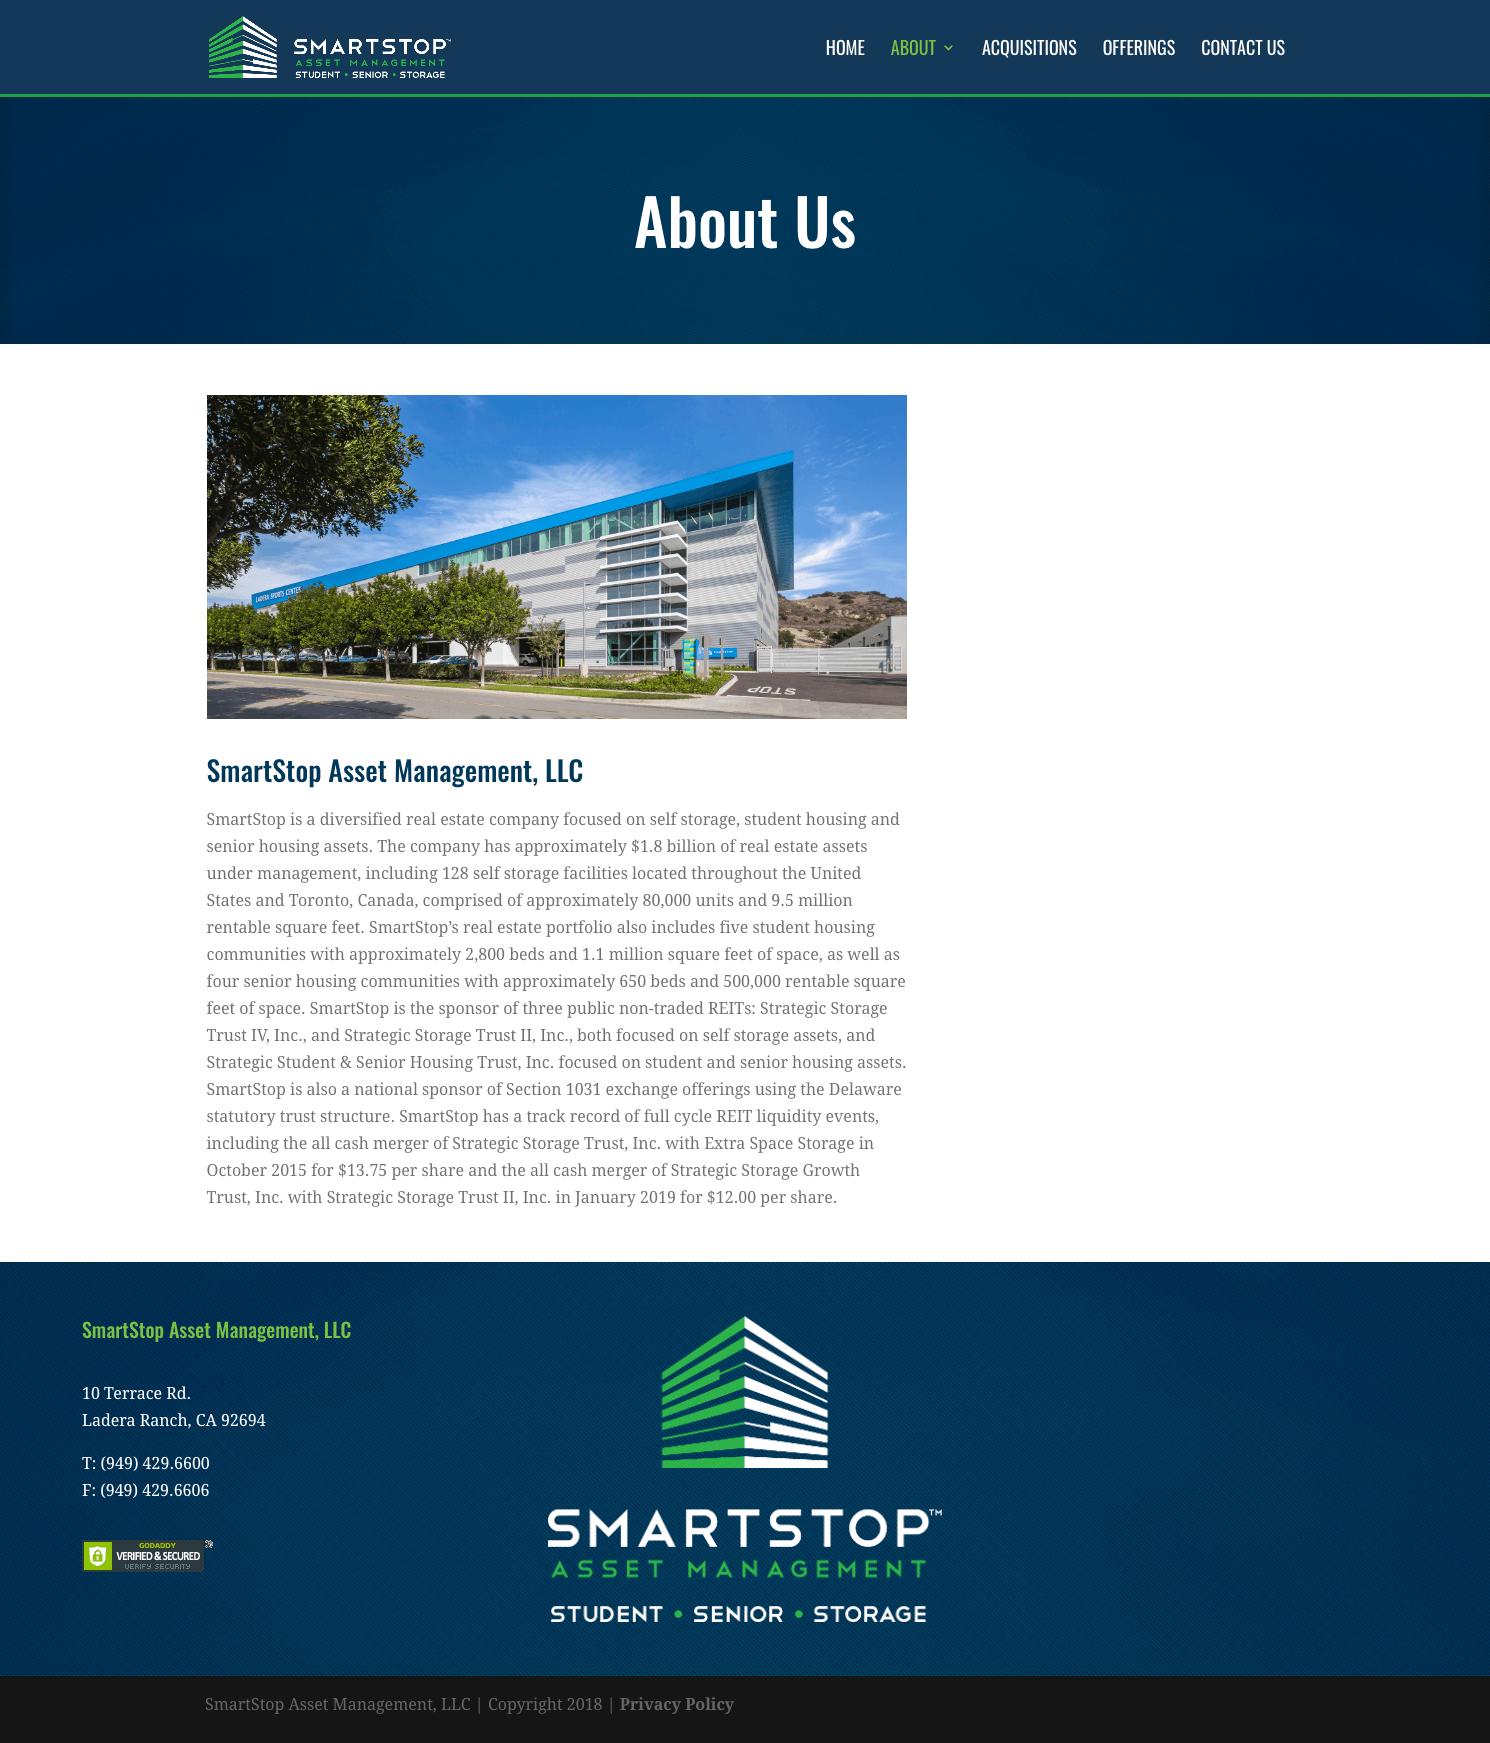 SmartStop-Asset-Management-Real-Estate-Investment-Trust-REIT-1031-Exchanges-Website-Design-About-Page